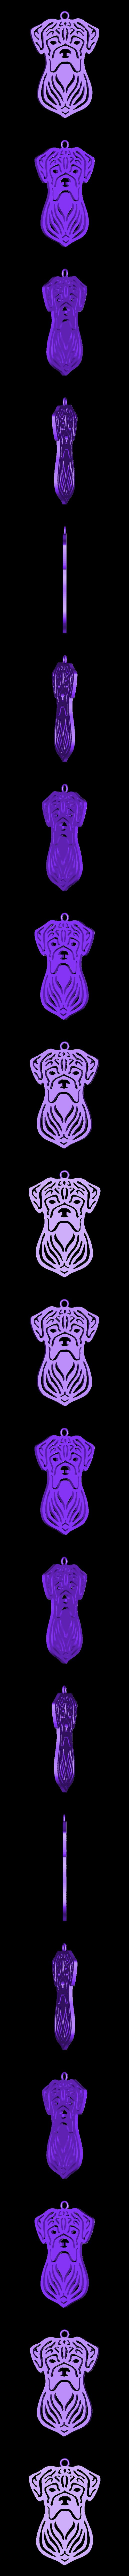 4.stl Download STL file Dogs • 3D printing object, GENNADI3313